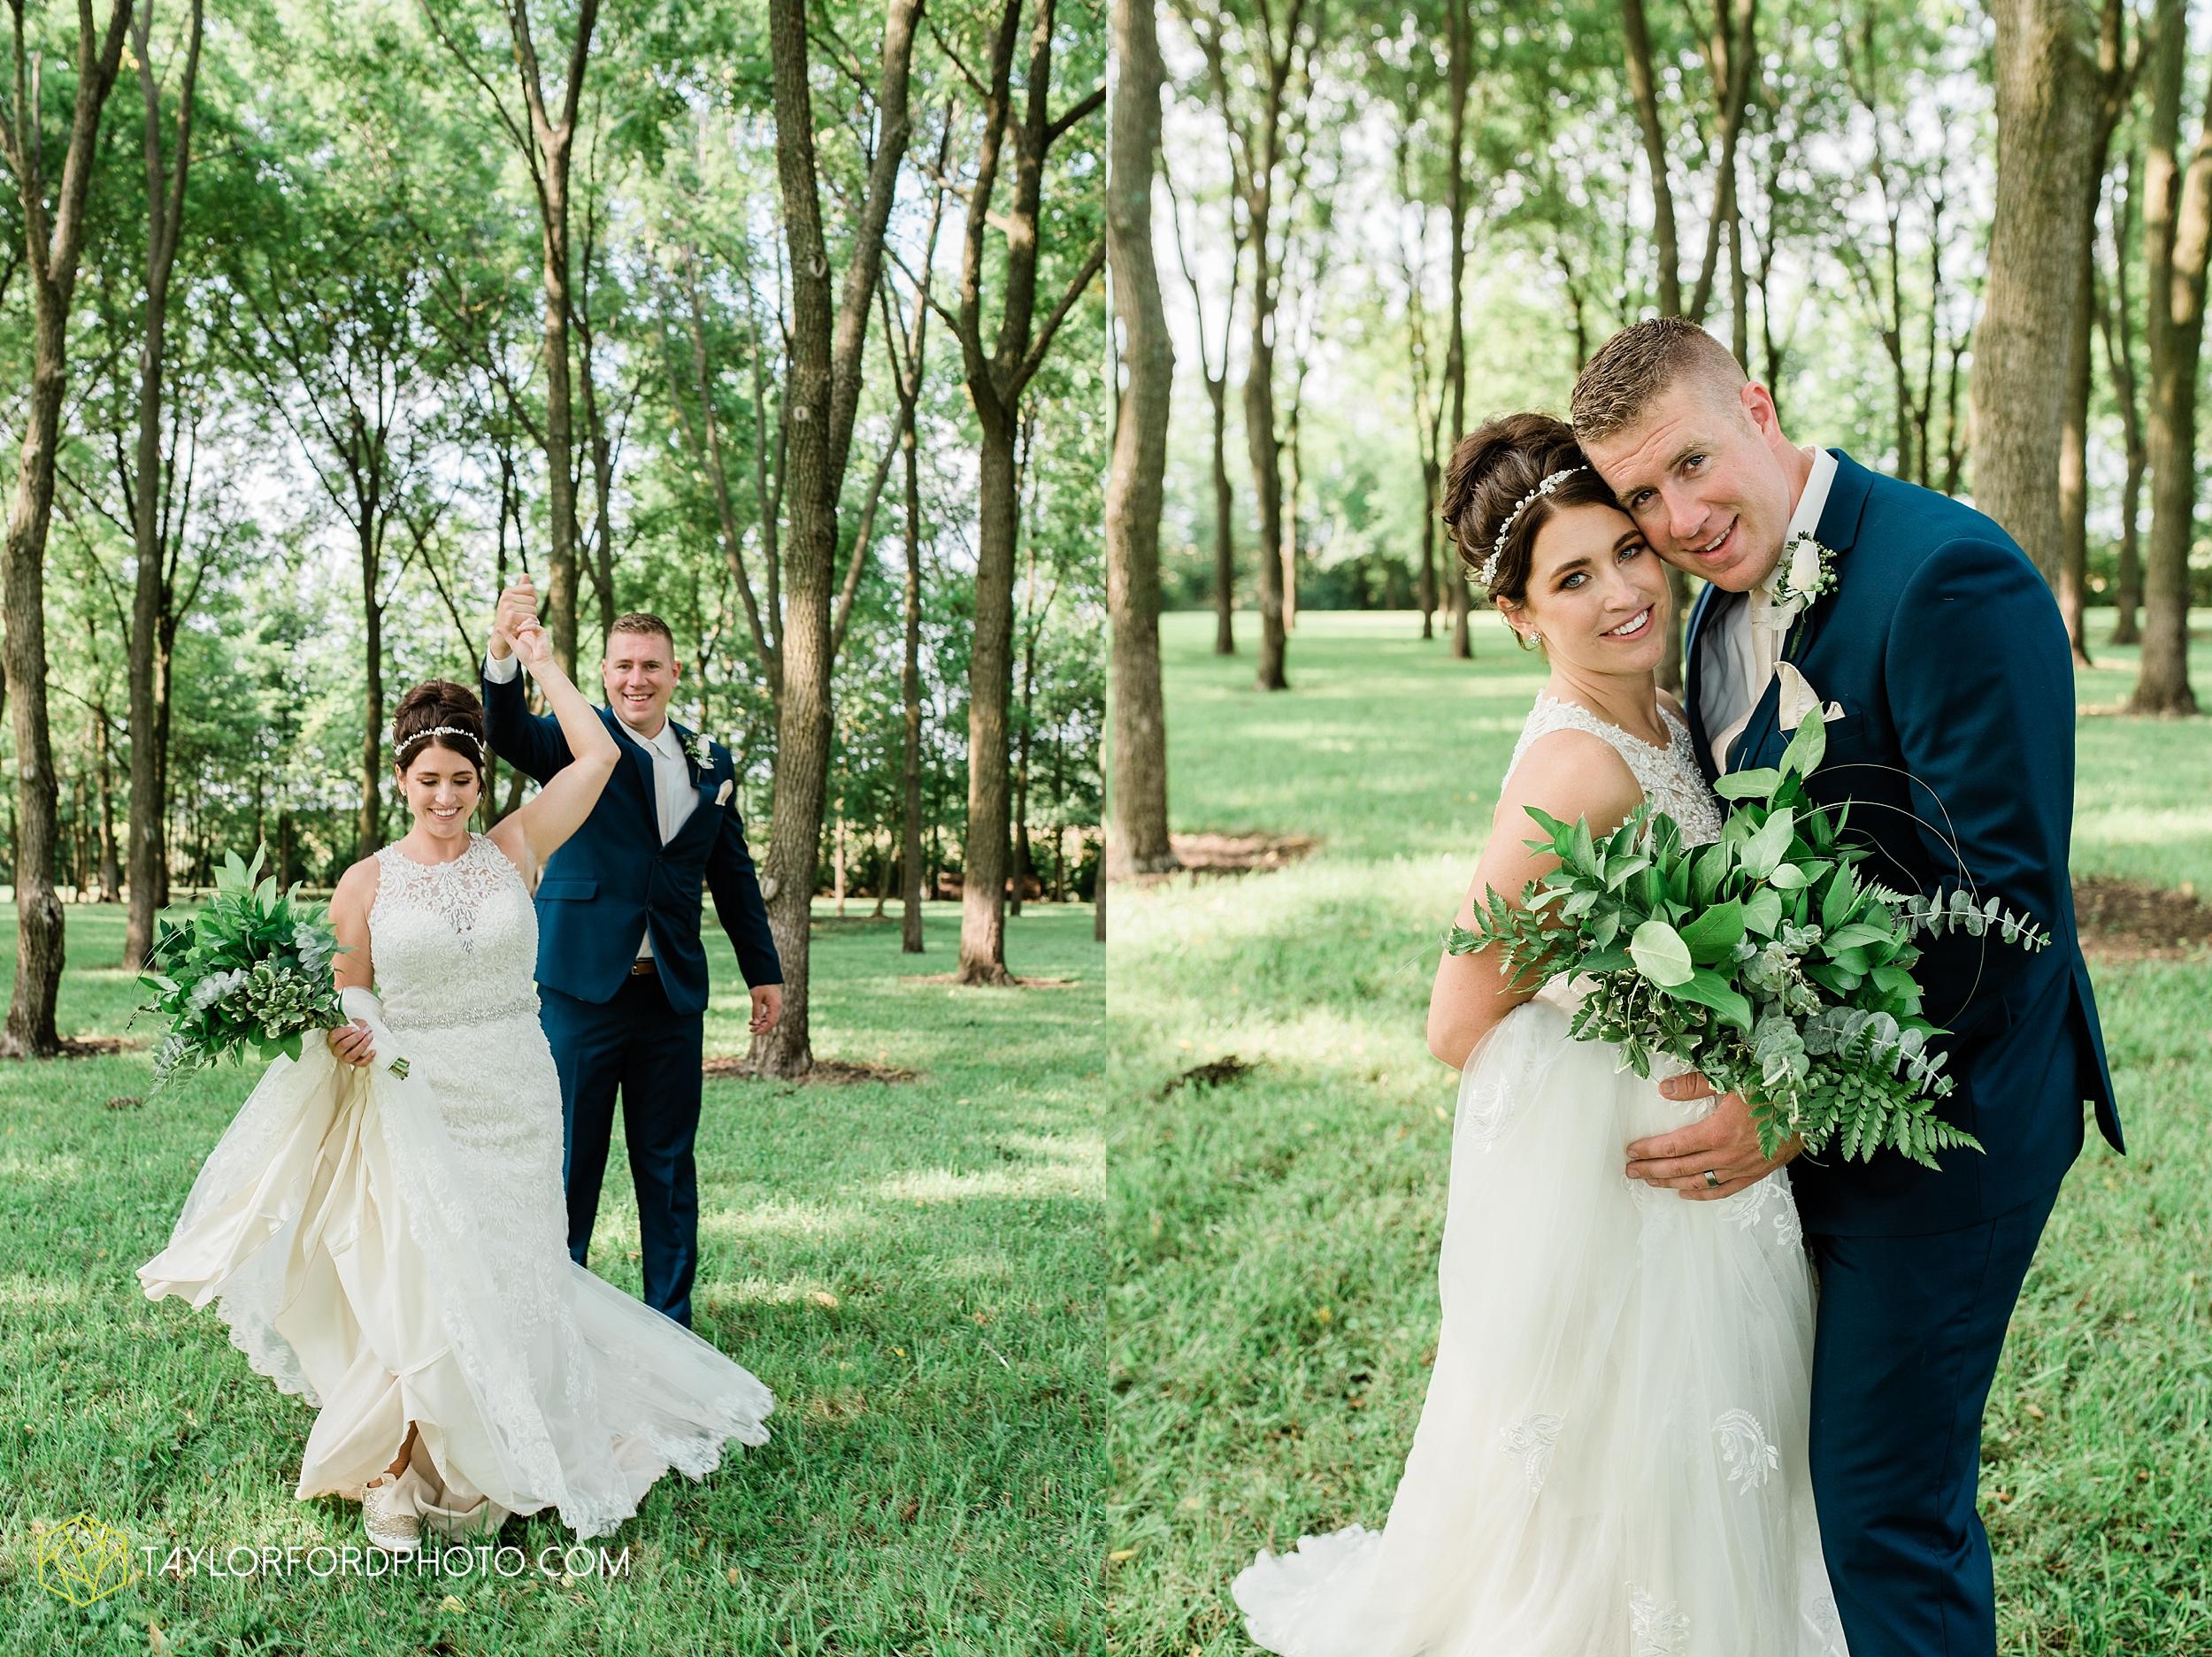 van-wert-ohio-first-united-methodist-church-county-dairy-barn-wedding-photographer-taylor-ford-photography_9853.jpg